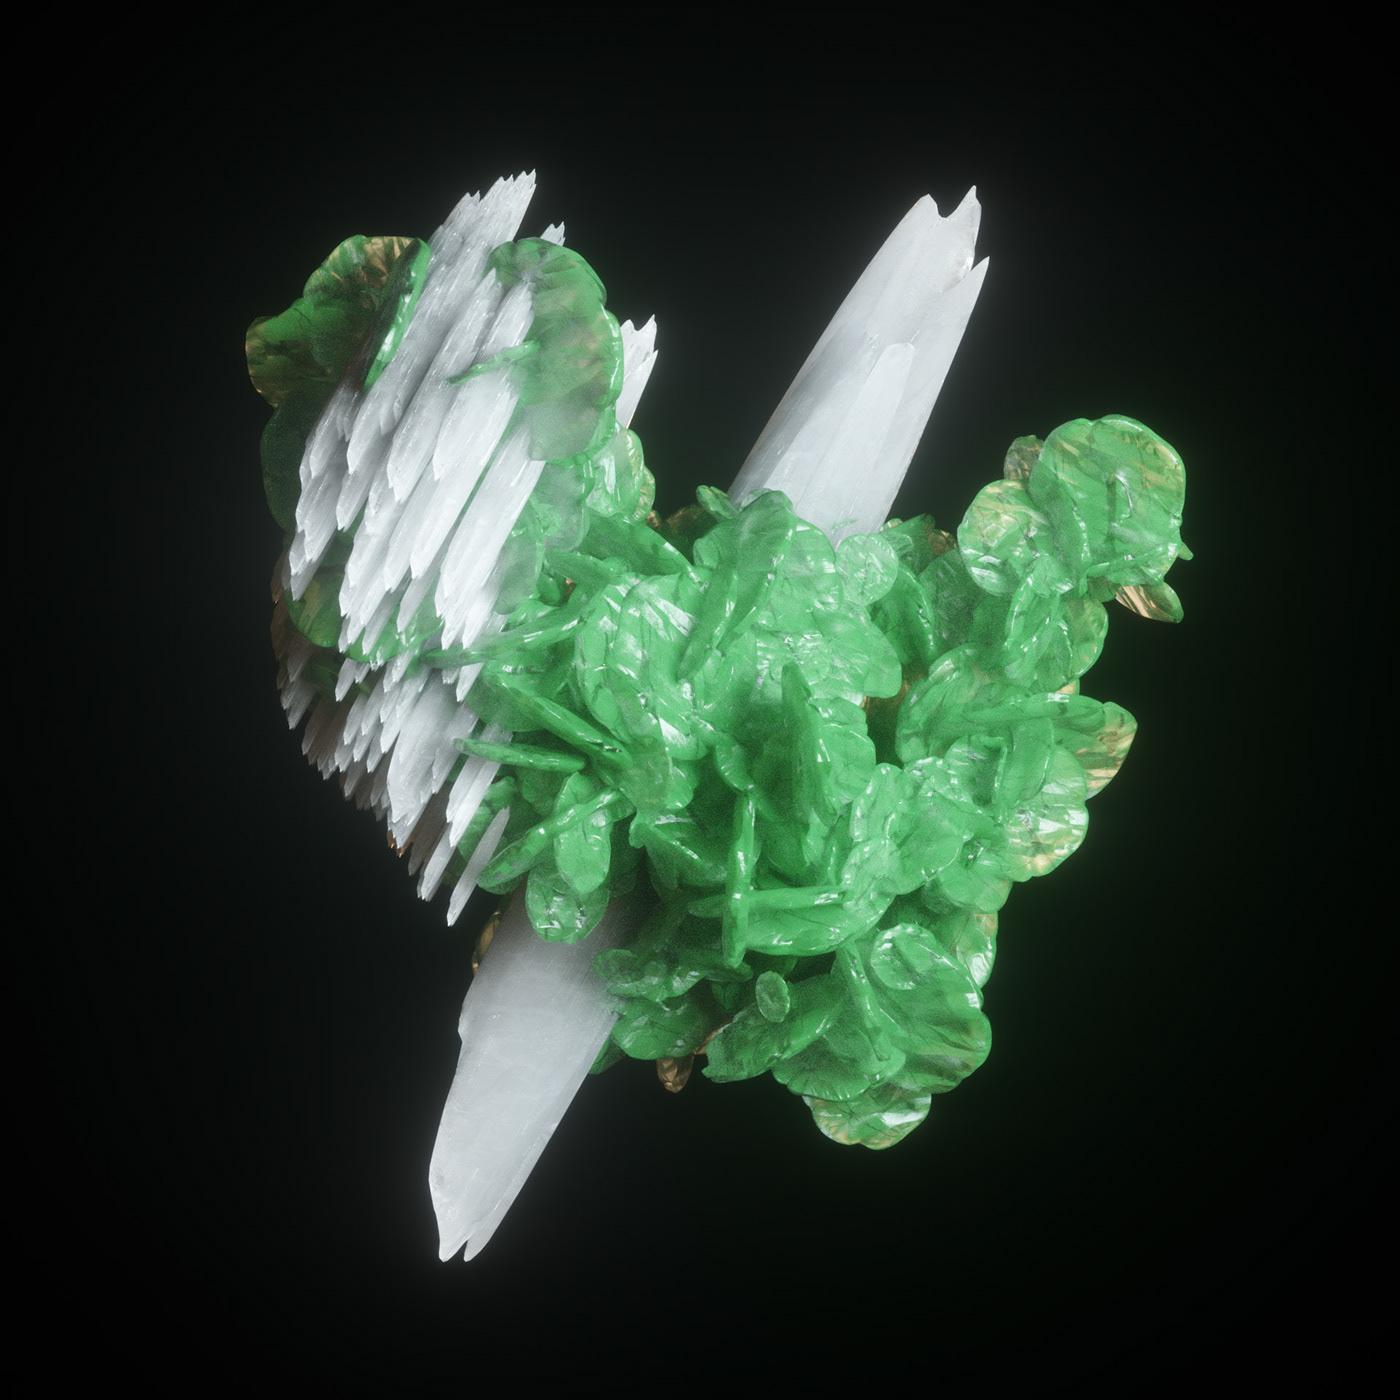 mineral geode 3D Render photoreal octane MoGraph cinema 4d organic science